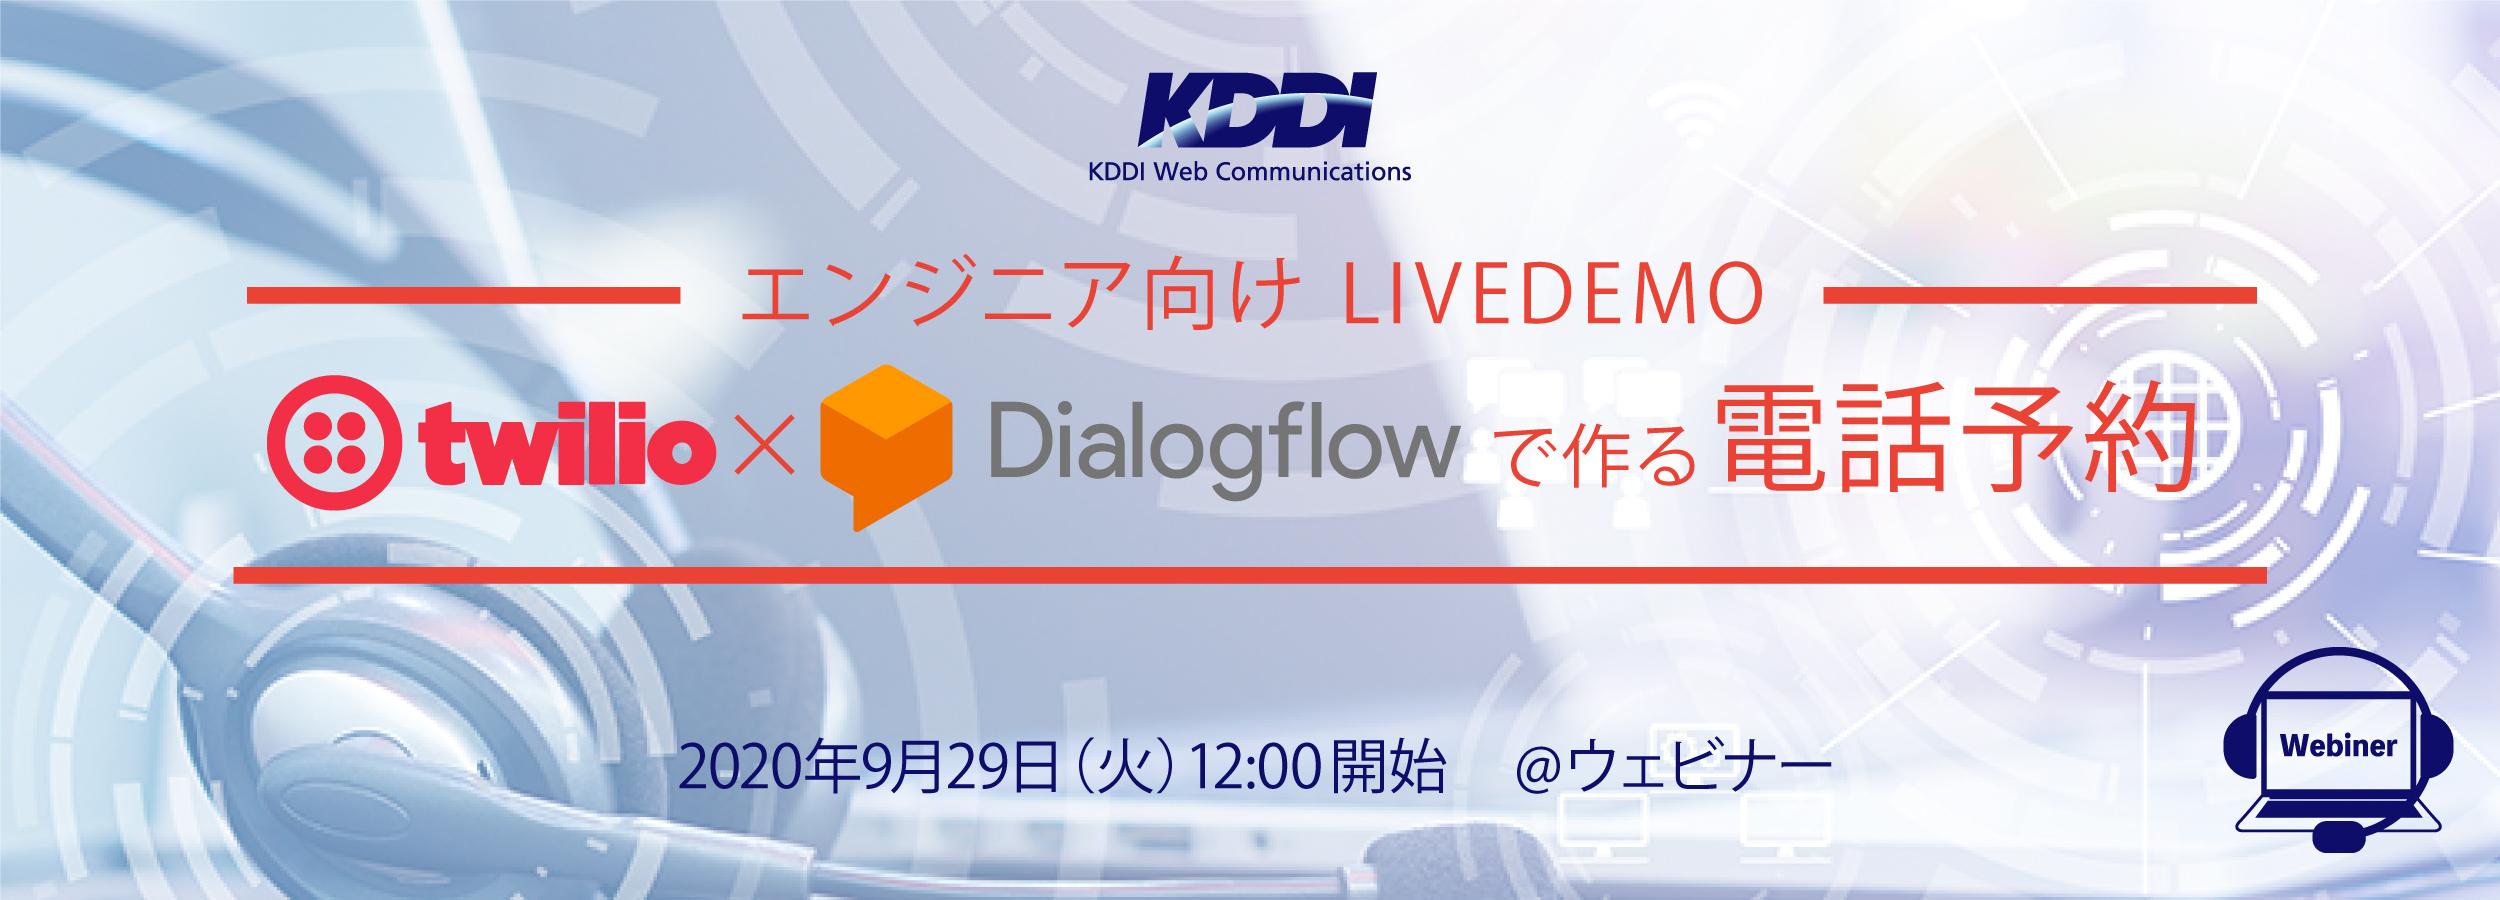 twilio_dialogflow-1